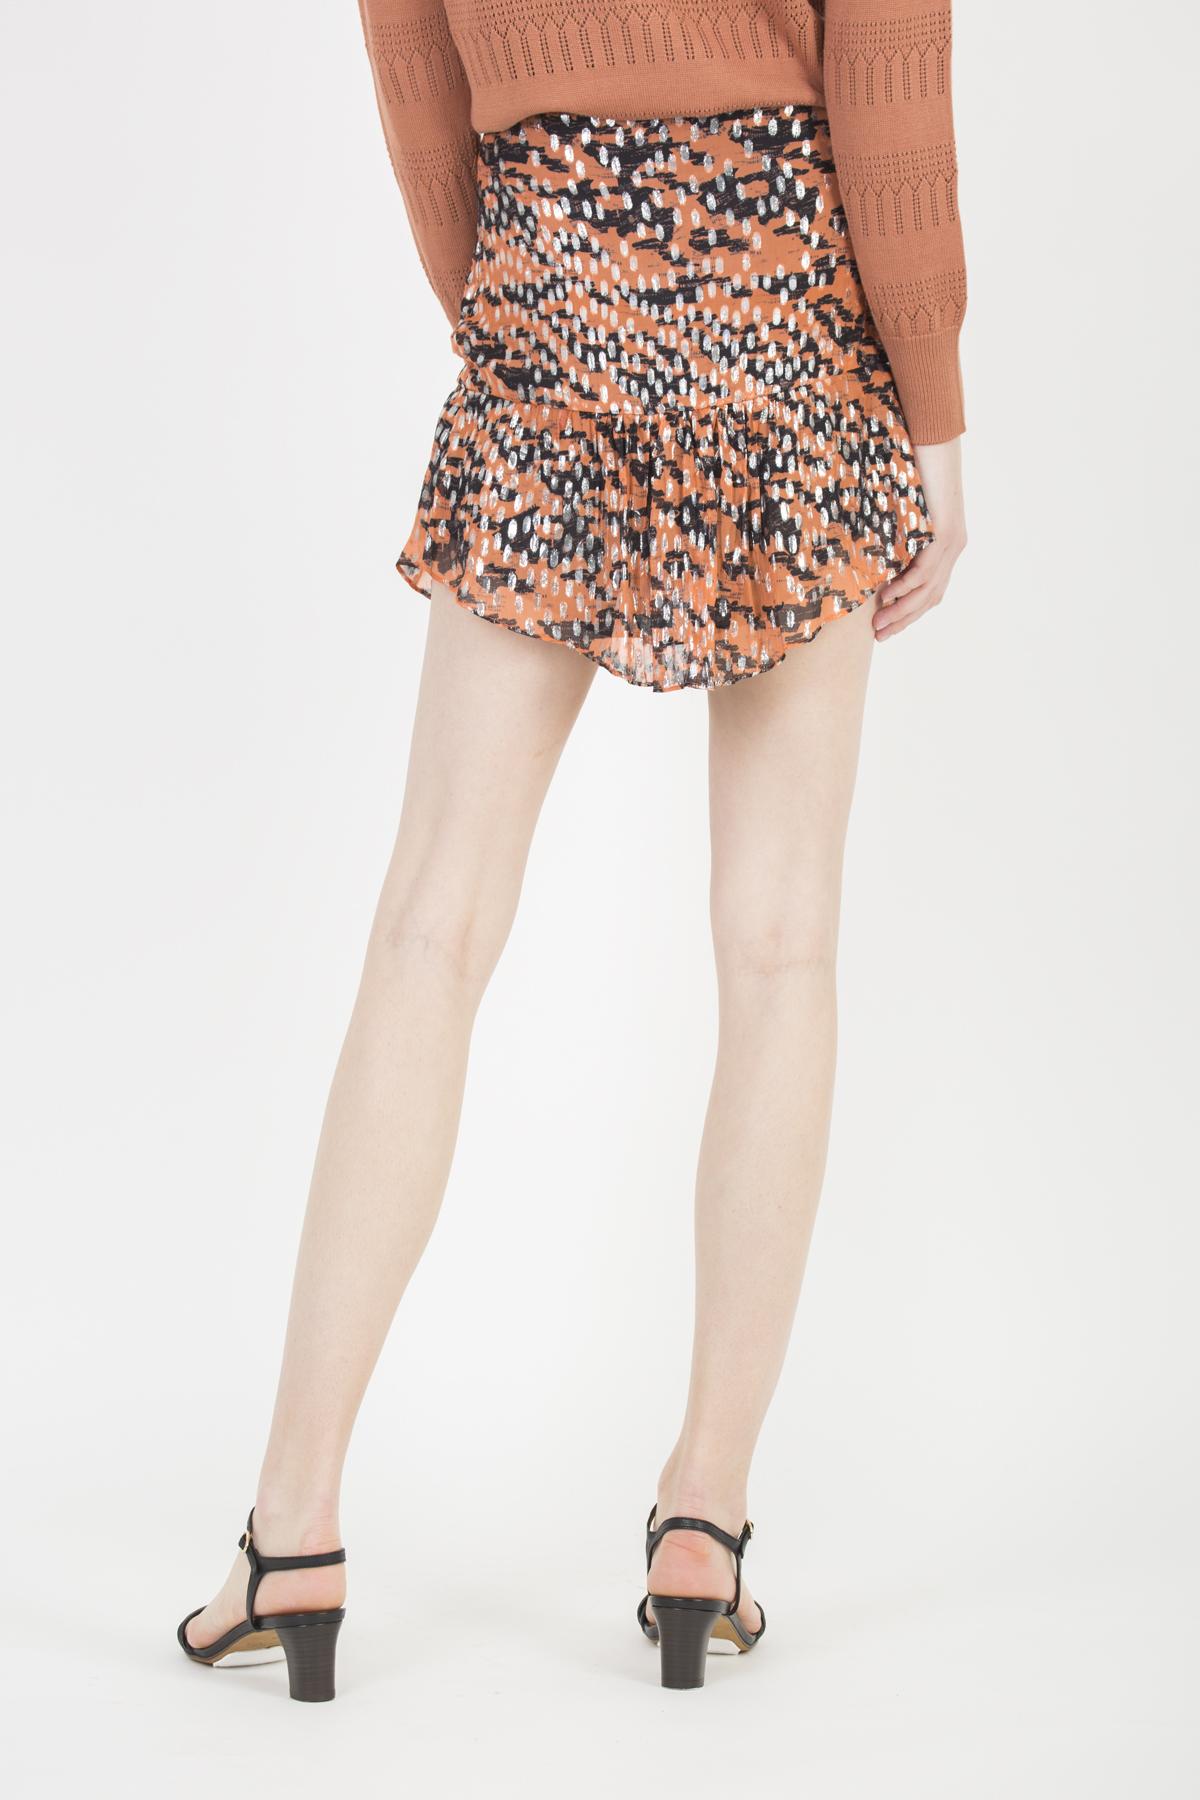 dilian-skirt-peach-silver-iro-mini-metallic-matchboxathens